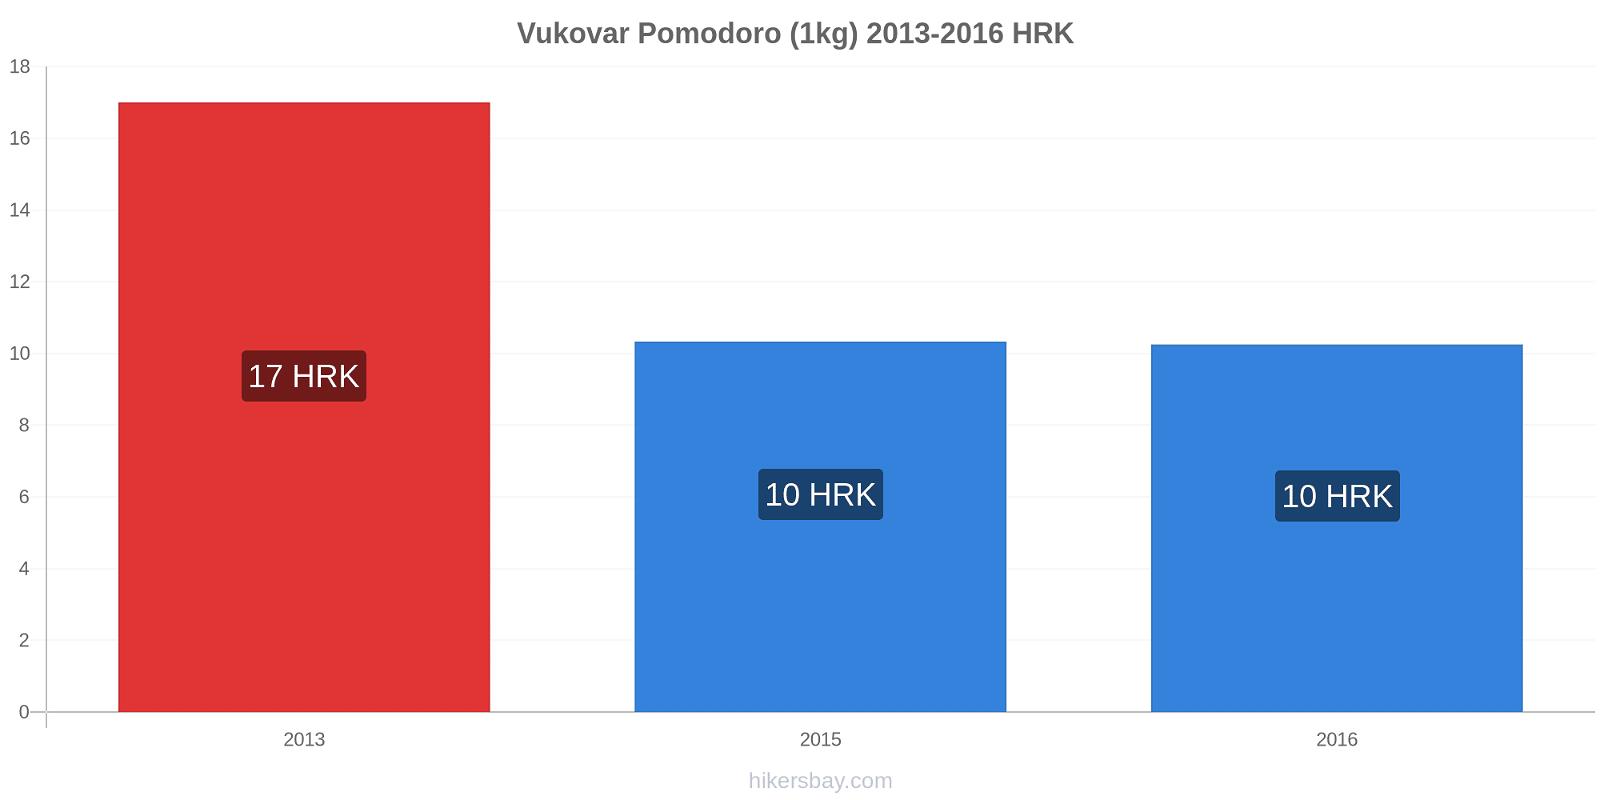 Vukovar variazioni di prezzo Pomodoro (1kg) hikersbay.com